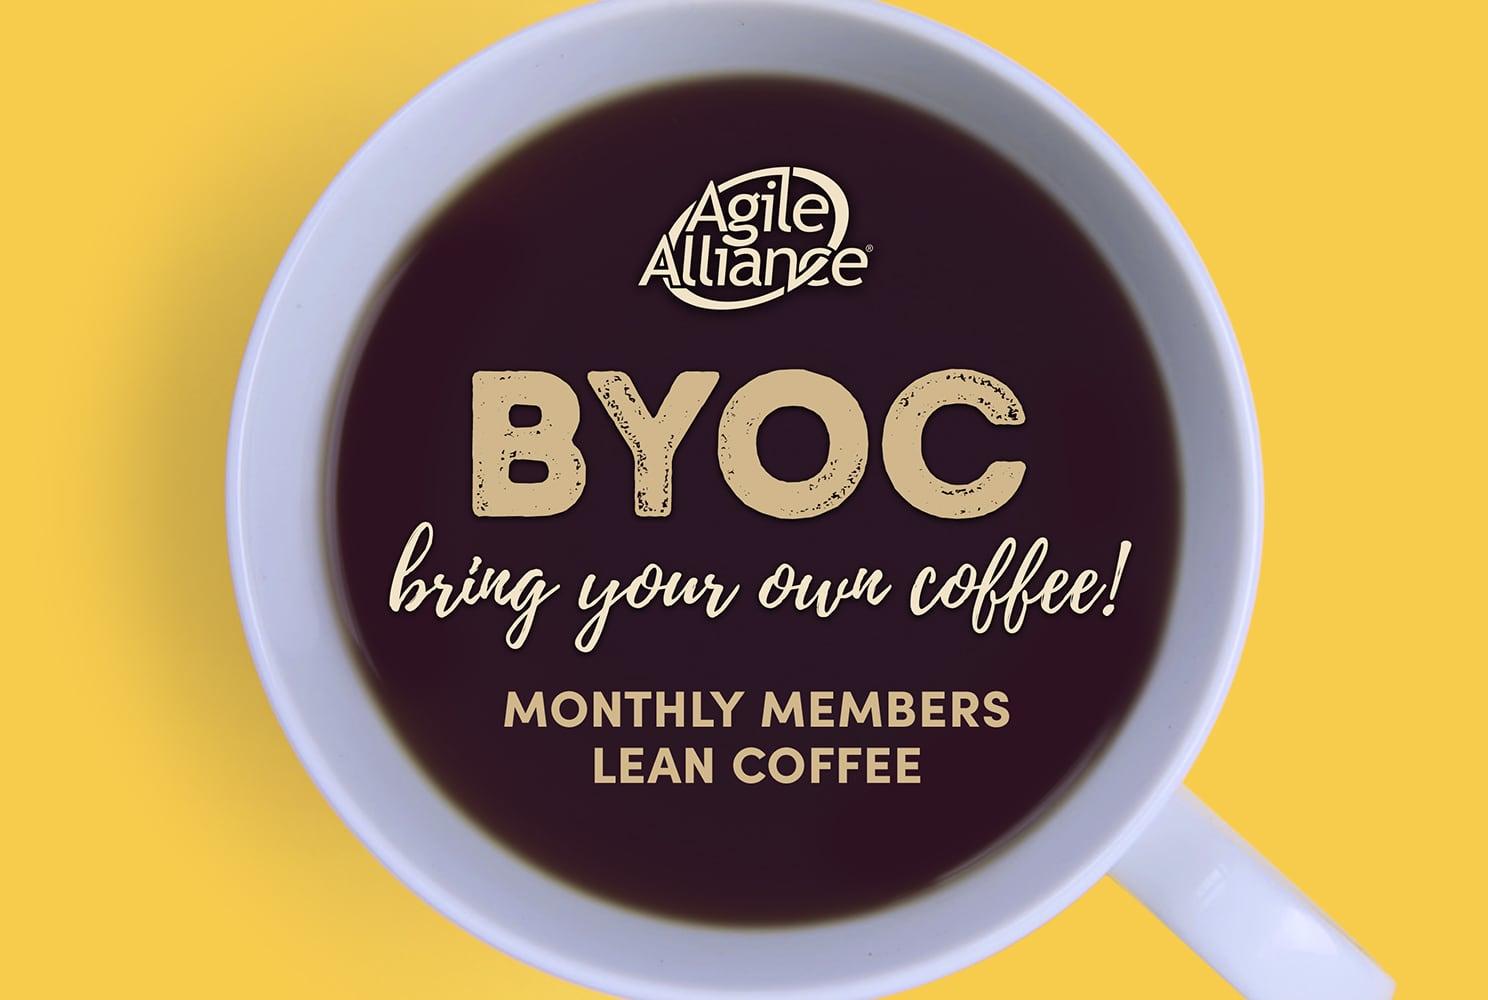 Agile Alliance BYOC Member Lean Coffee